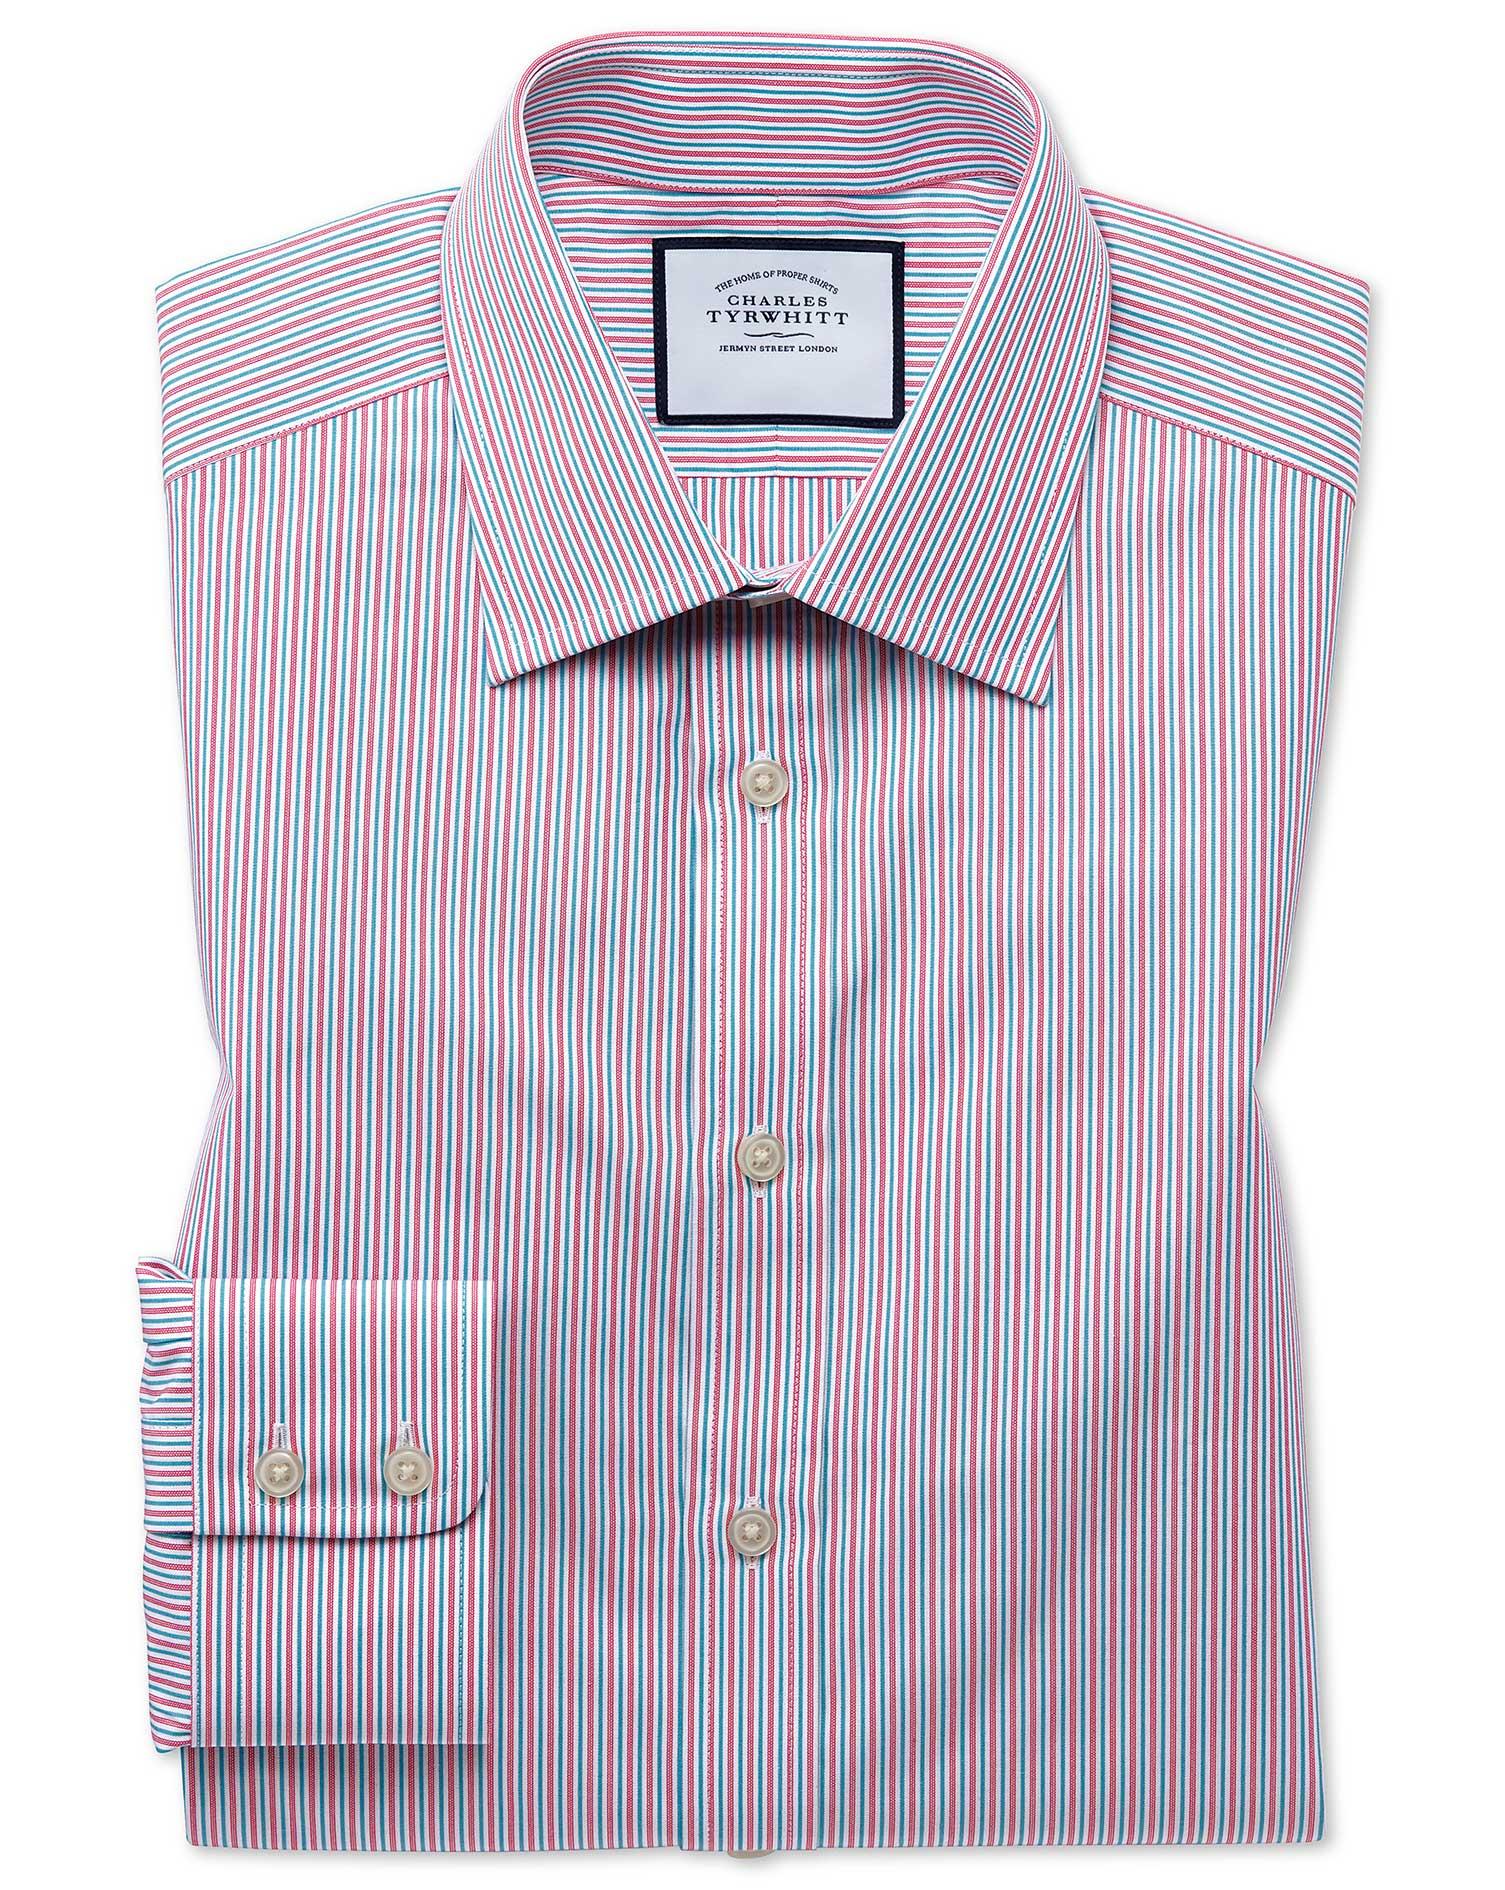 Slim Fit Egyptian Cotton Poplin Multi Pink Stripe Formal Shirt Single Cuff Size 18/37 by Charles Tyr